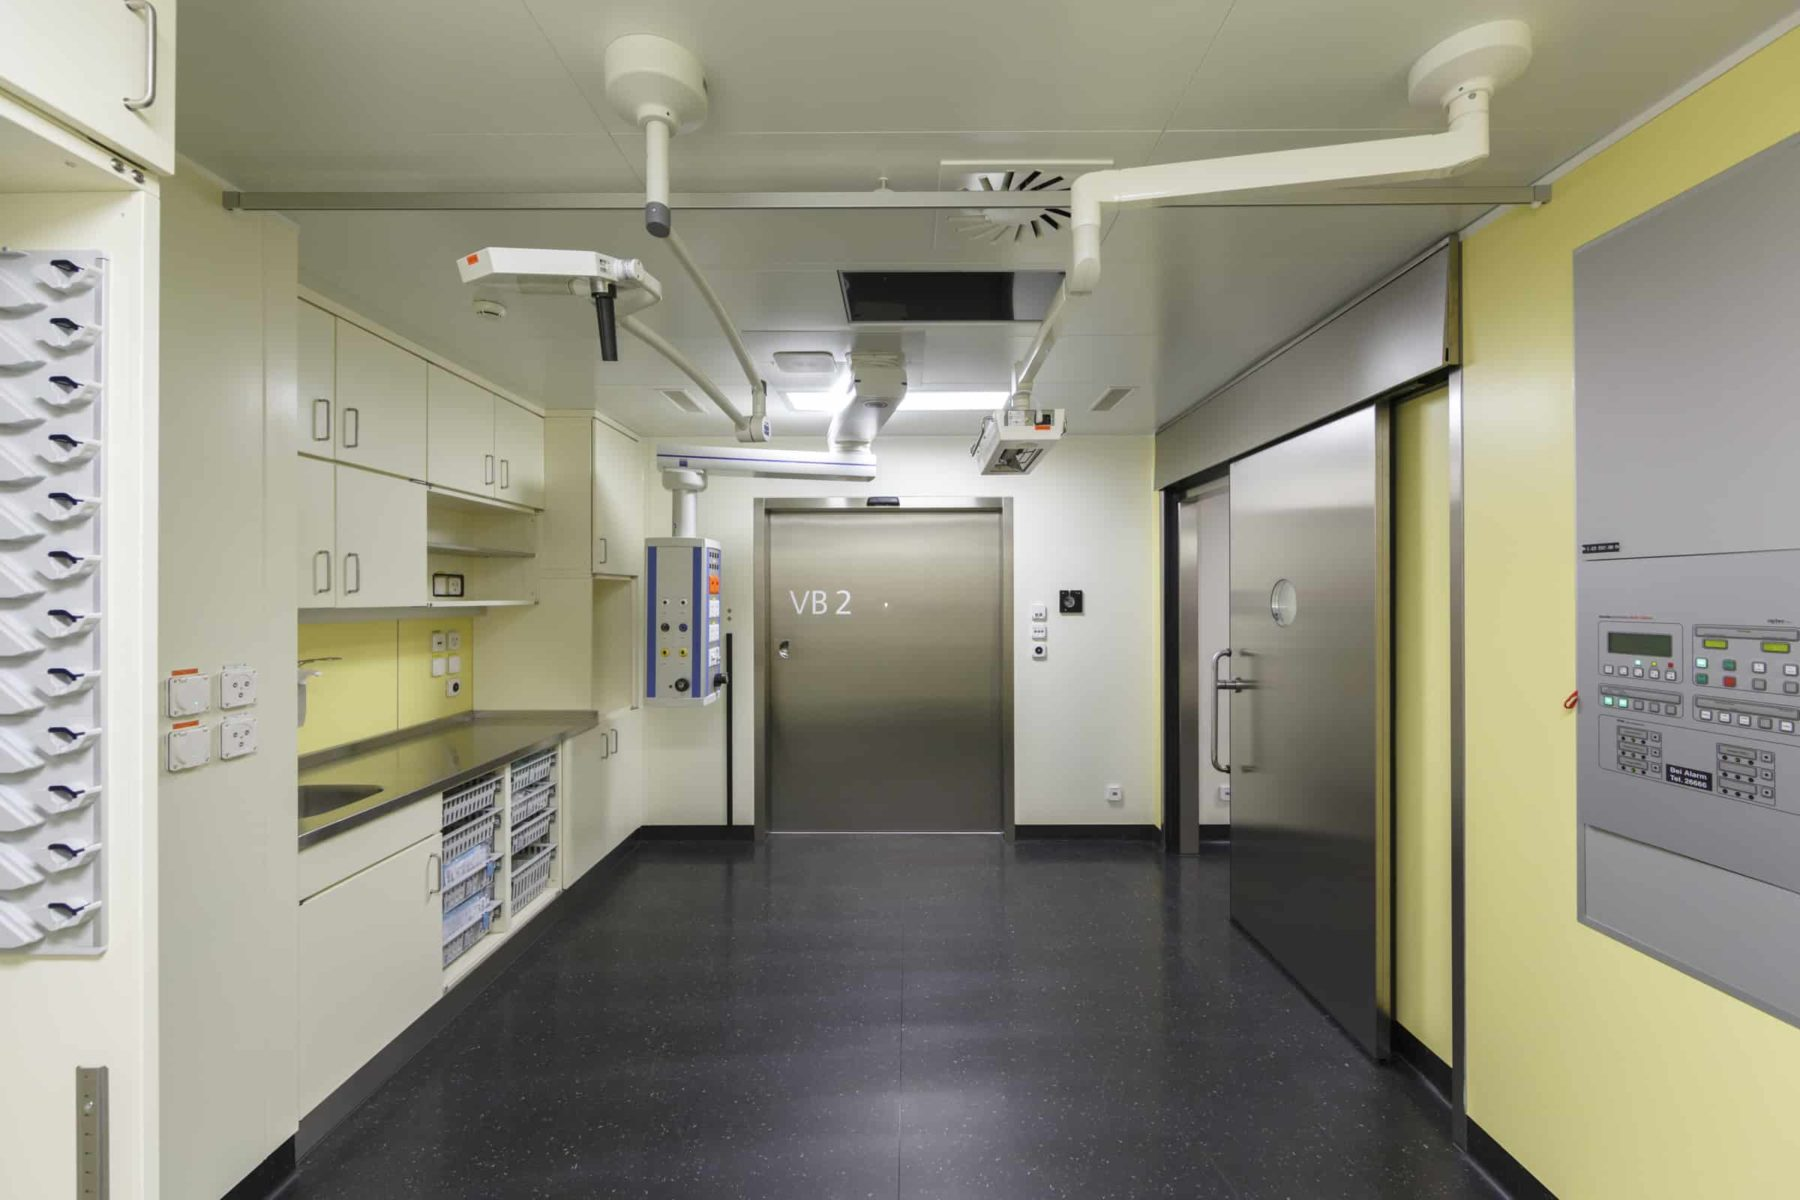 Kinderklinik, Gesamtsanierung, neue Operationseinheit